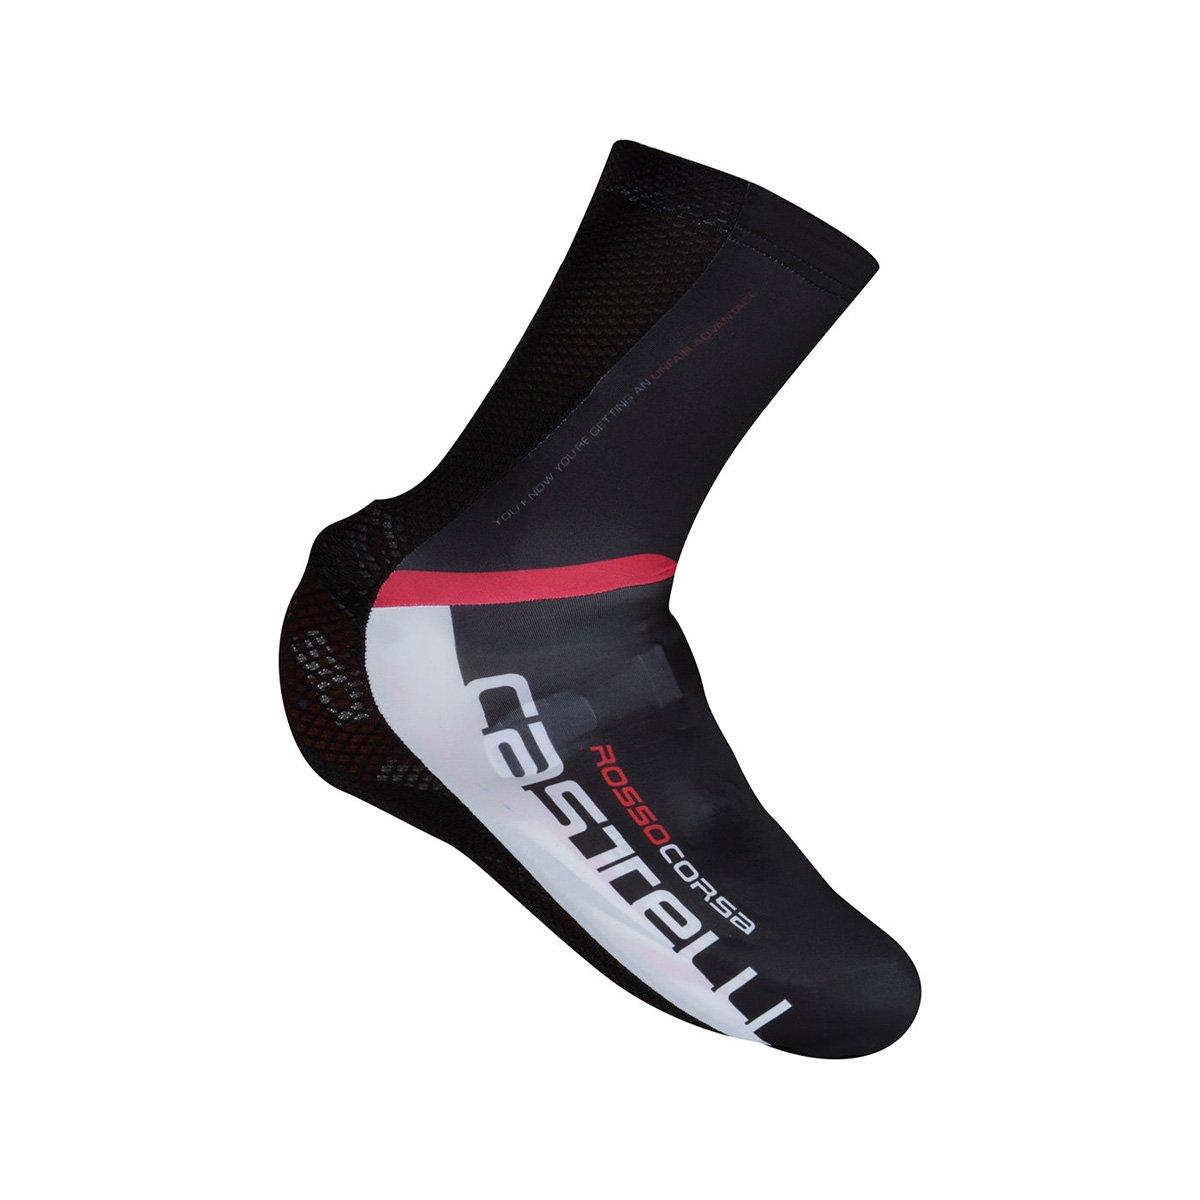 Castelli 2018 Aero Race Mr Cycling Shoecover - S16031 B01BFAZEI6 Small|Black/White